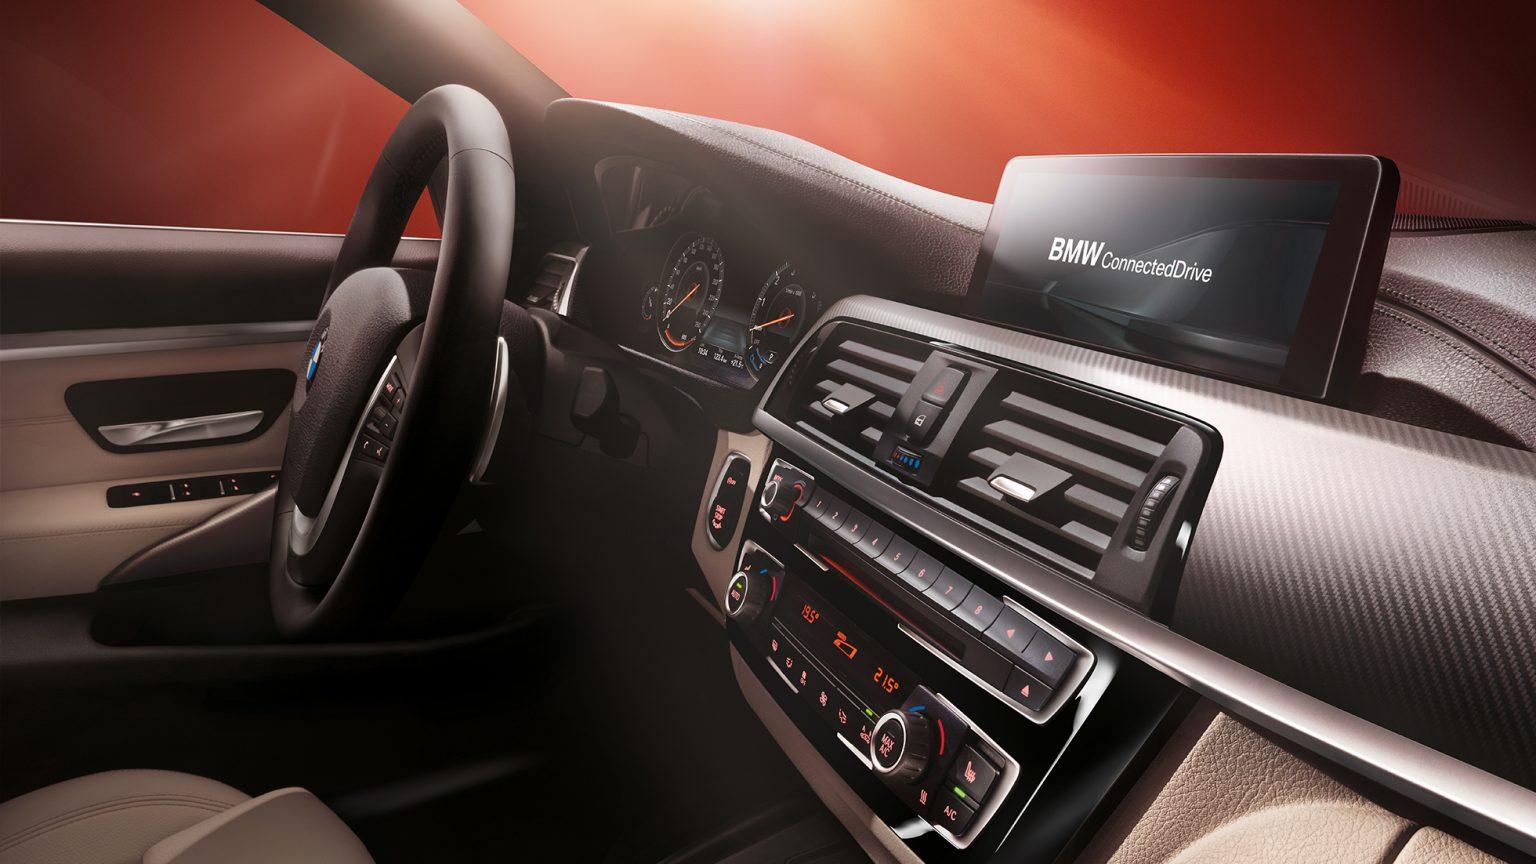 bmw-4-series-convertible-inspire-mg-exterior-interior-design-desktop-04